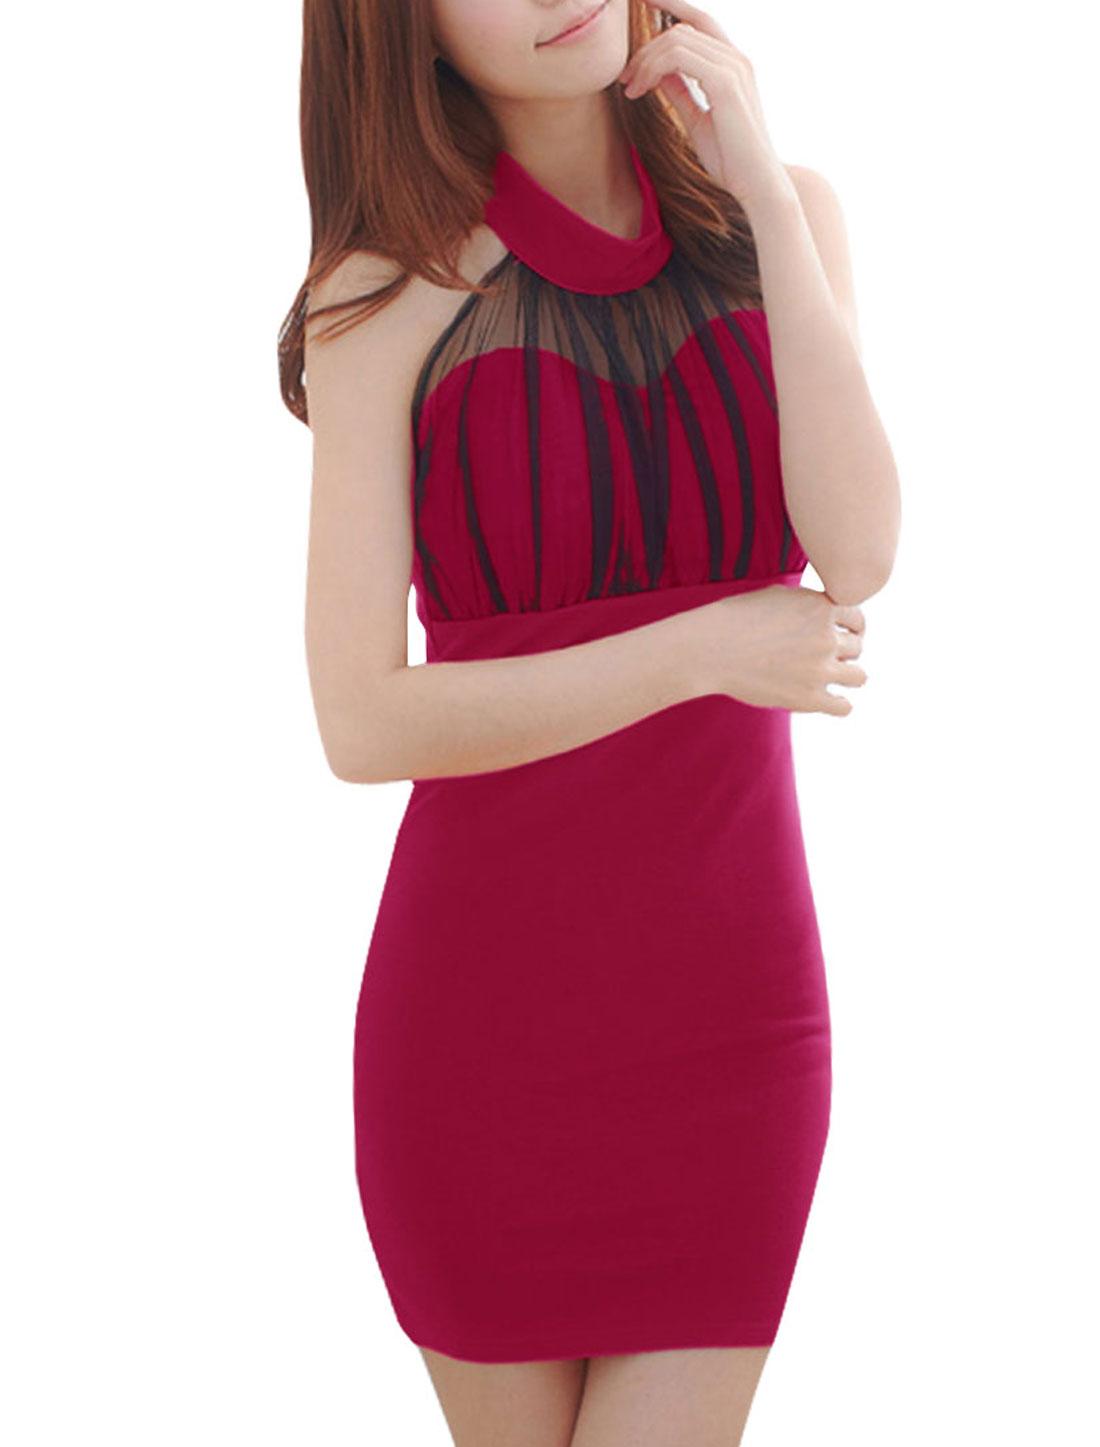 Lady Sleeveless Slim Fit Paded Bust Fuchsia Mini Dress XS